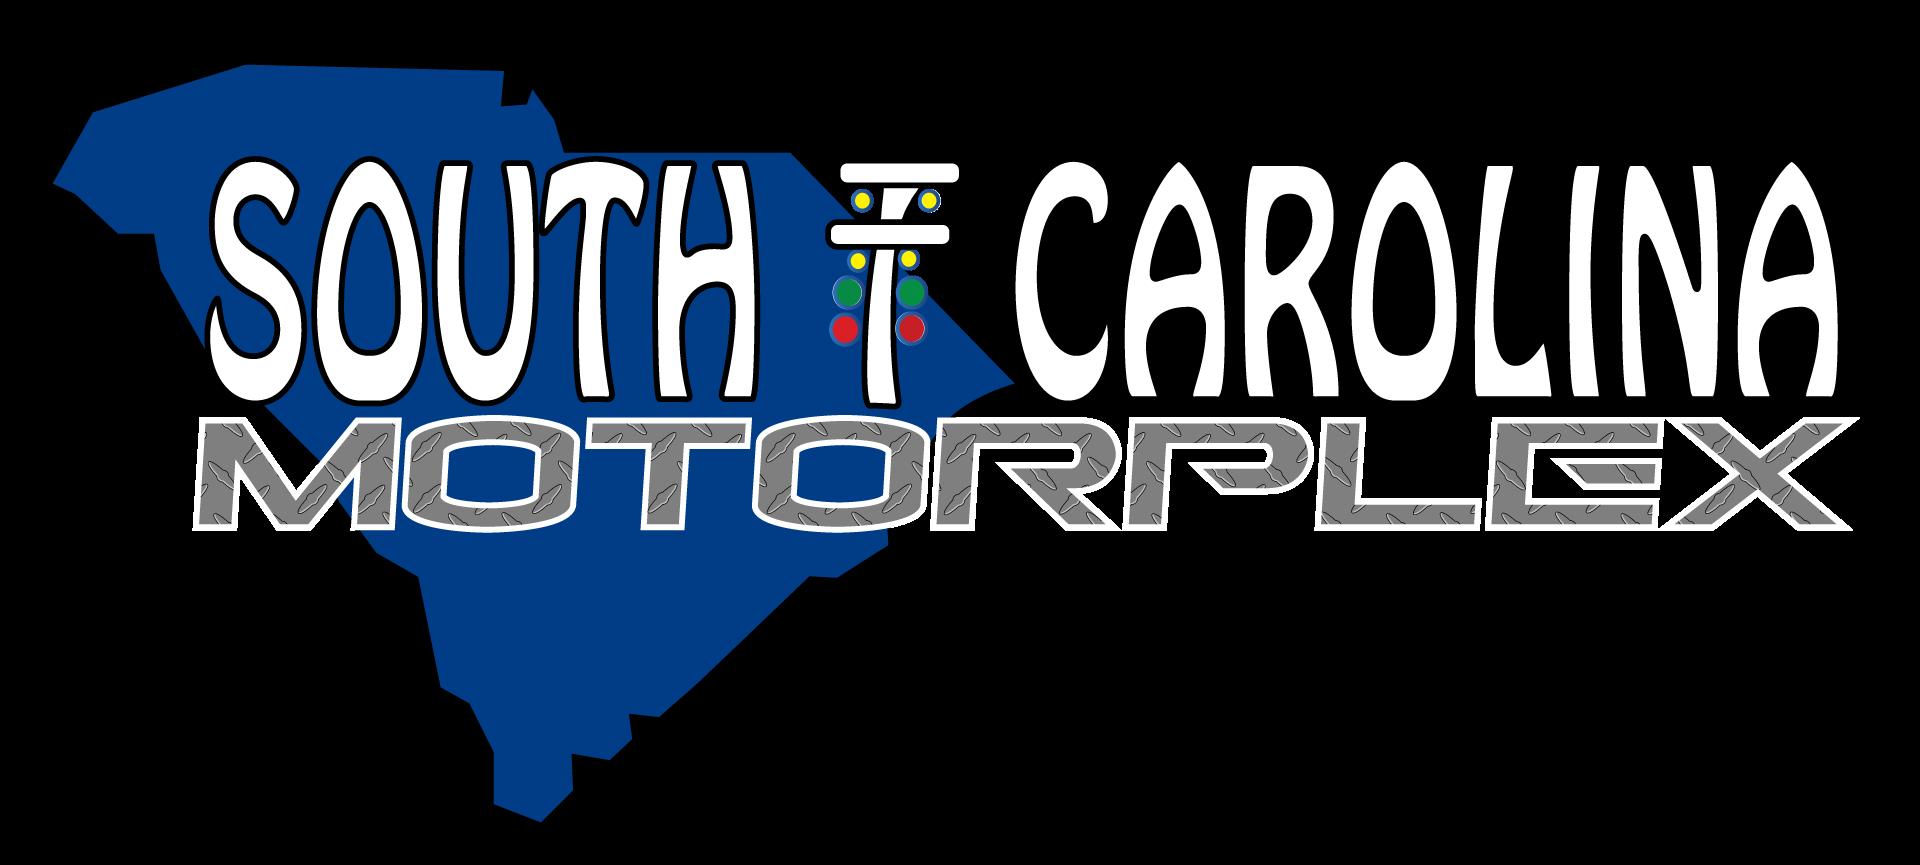 South Carolina Motorplex | News